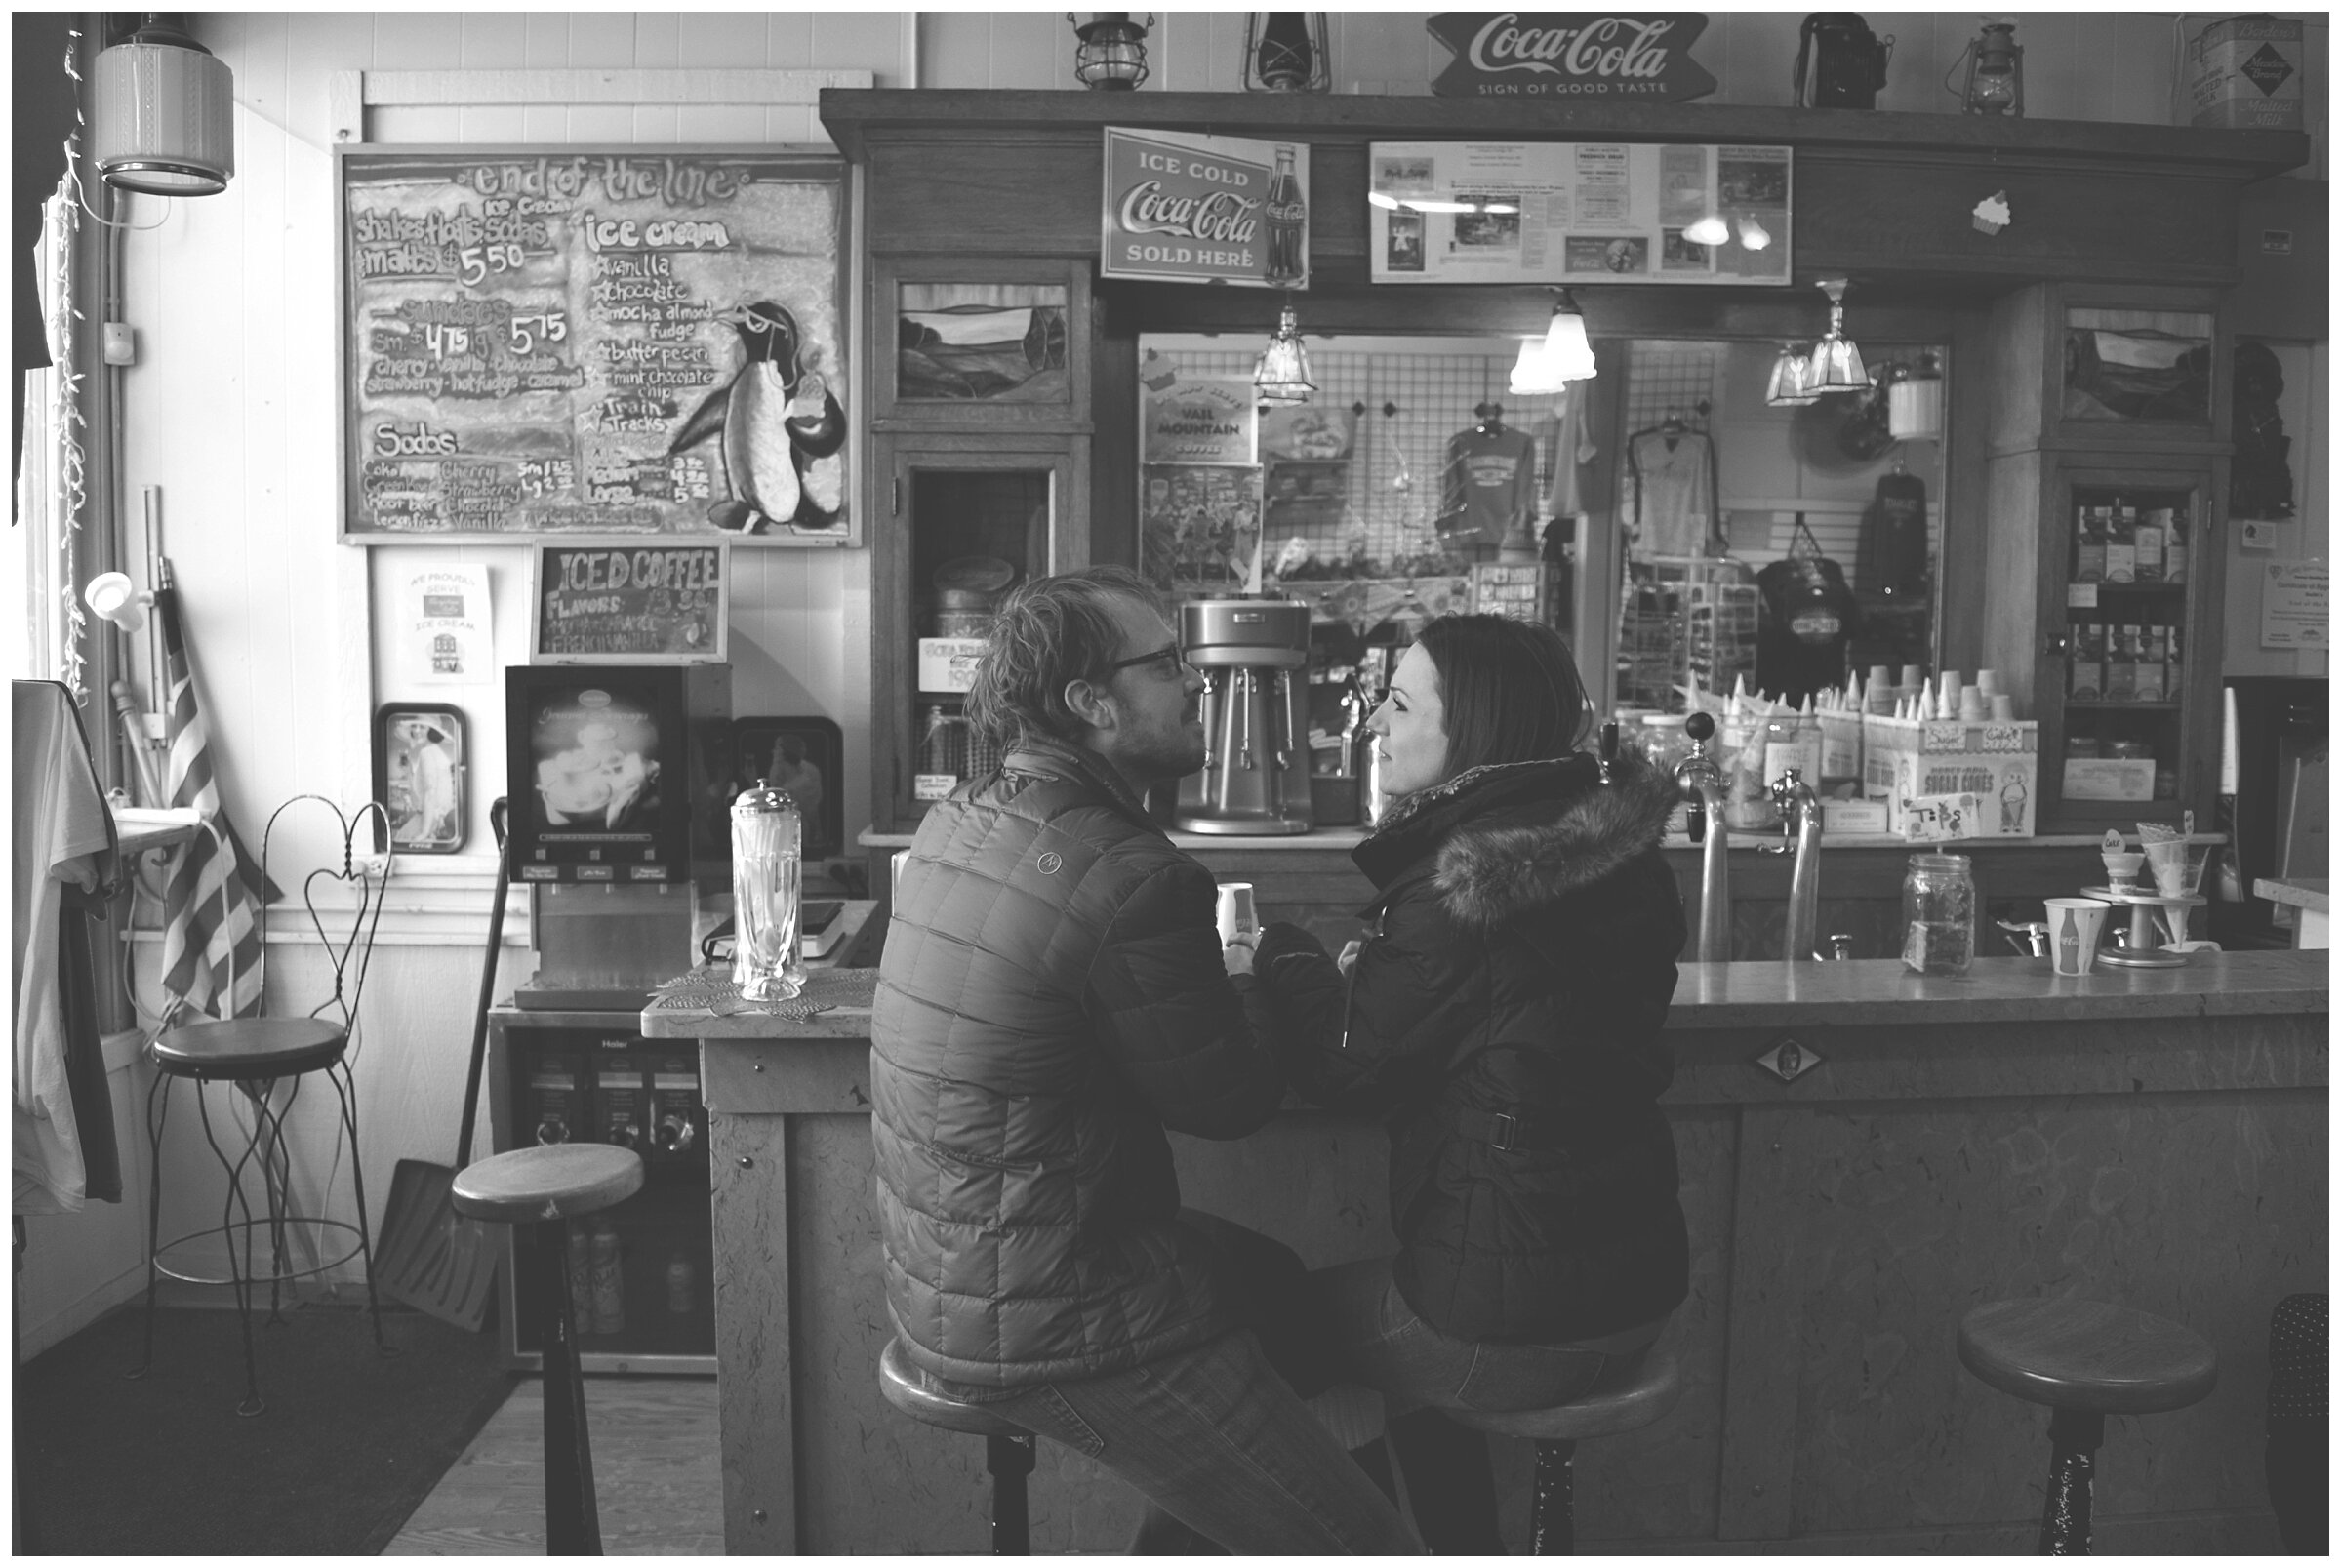 georgetown engagement photos, winter engagement photos colorado, colorado engagement photographer, denver engagement photographer, denver wedding photographer and videographer, Colorado wedding videographer, Denver wedding videographer, Small Colorado Wedding Photographer